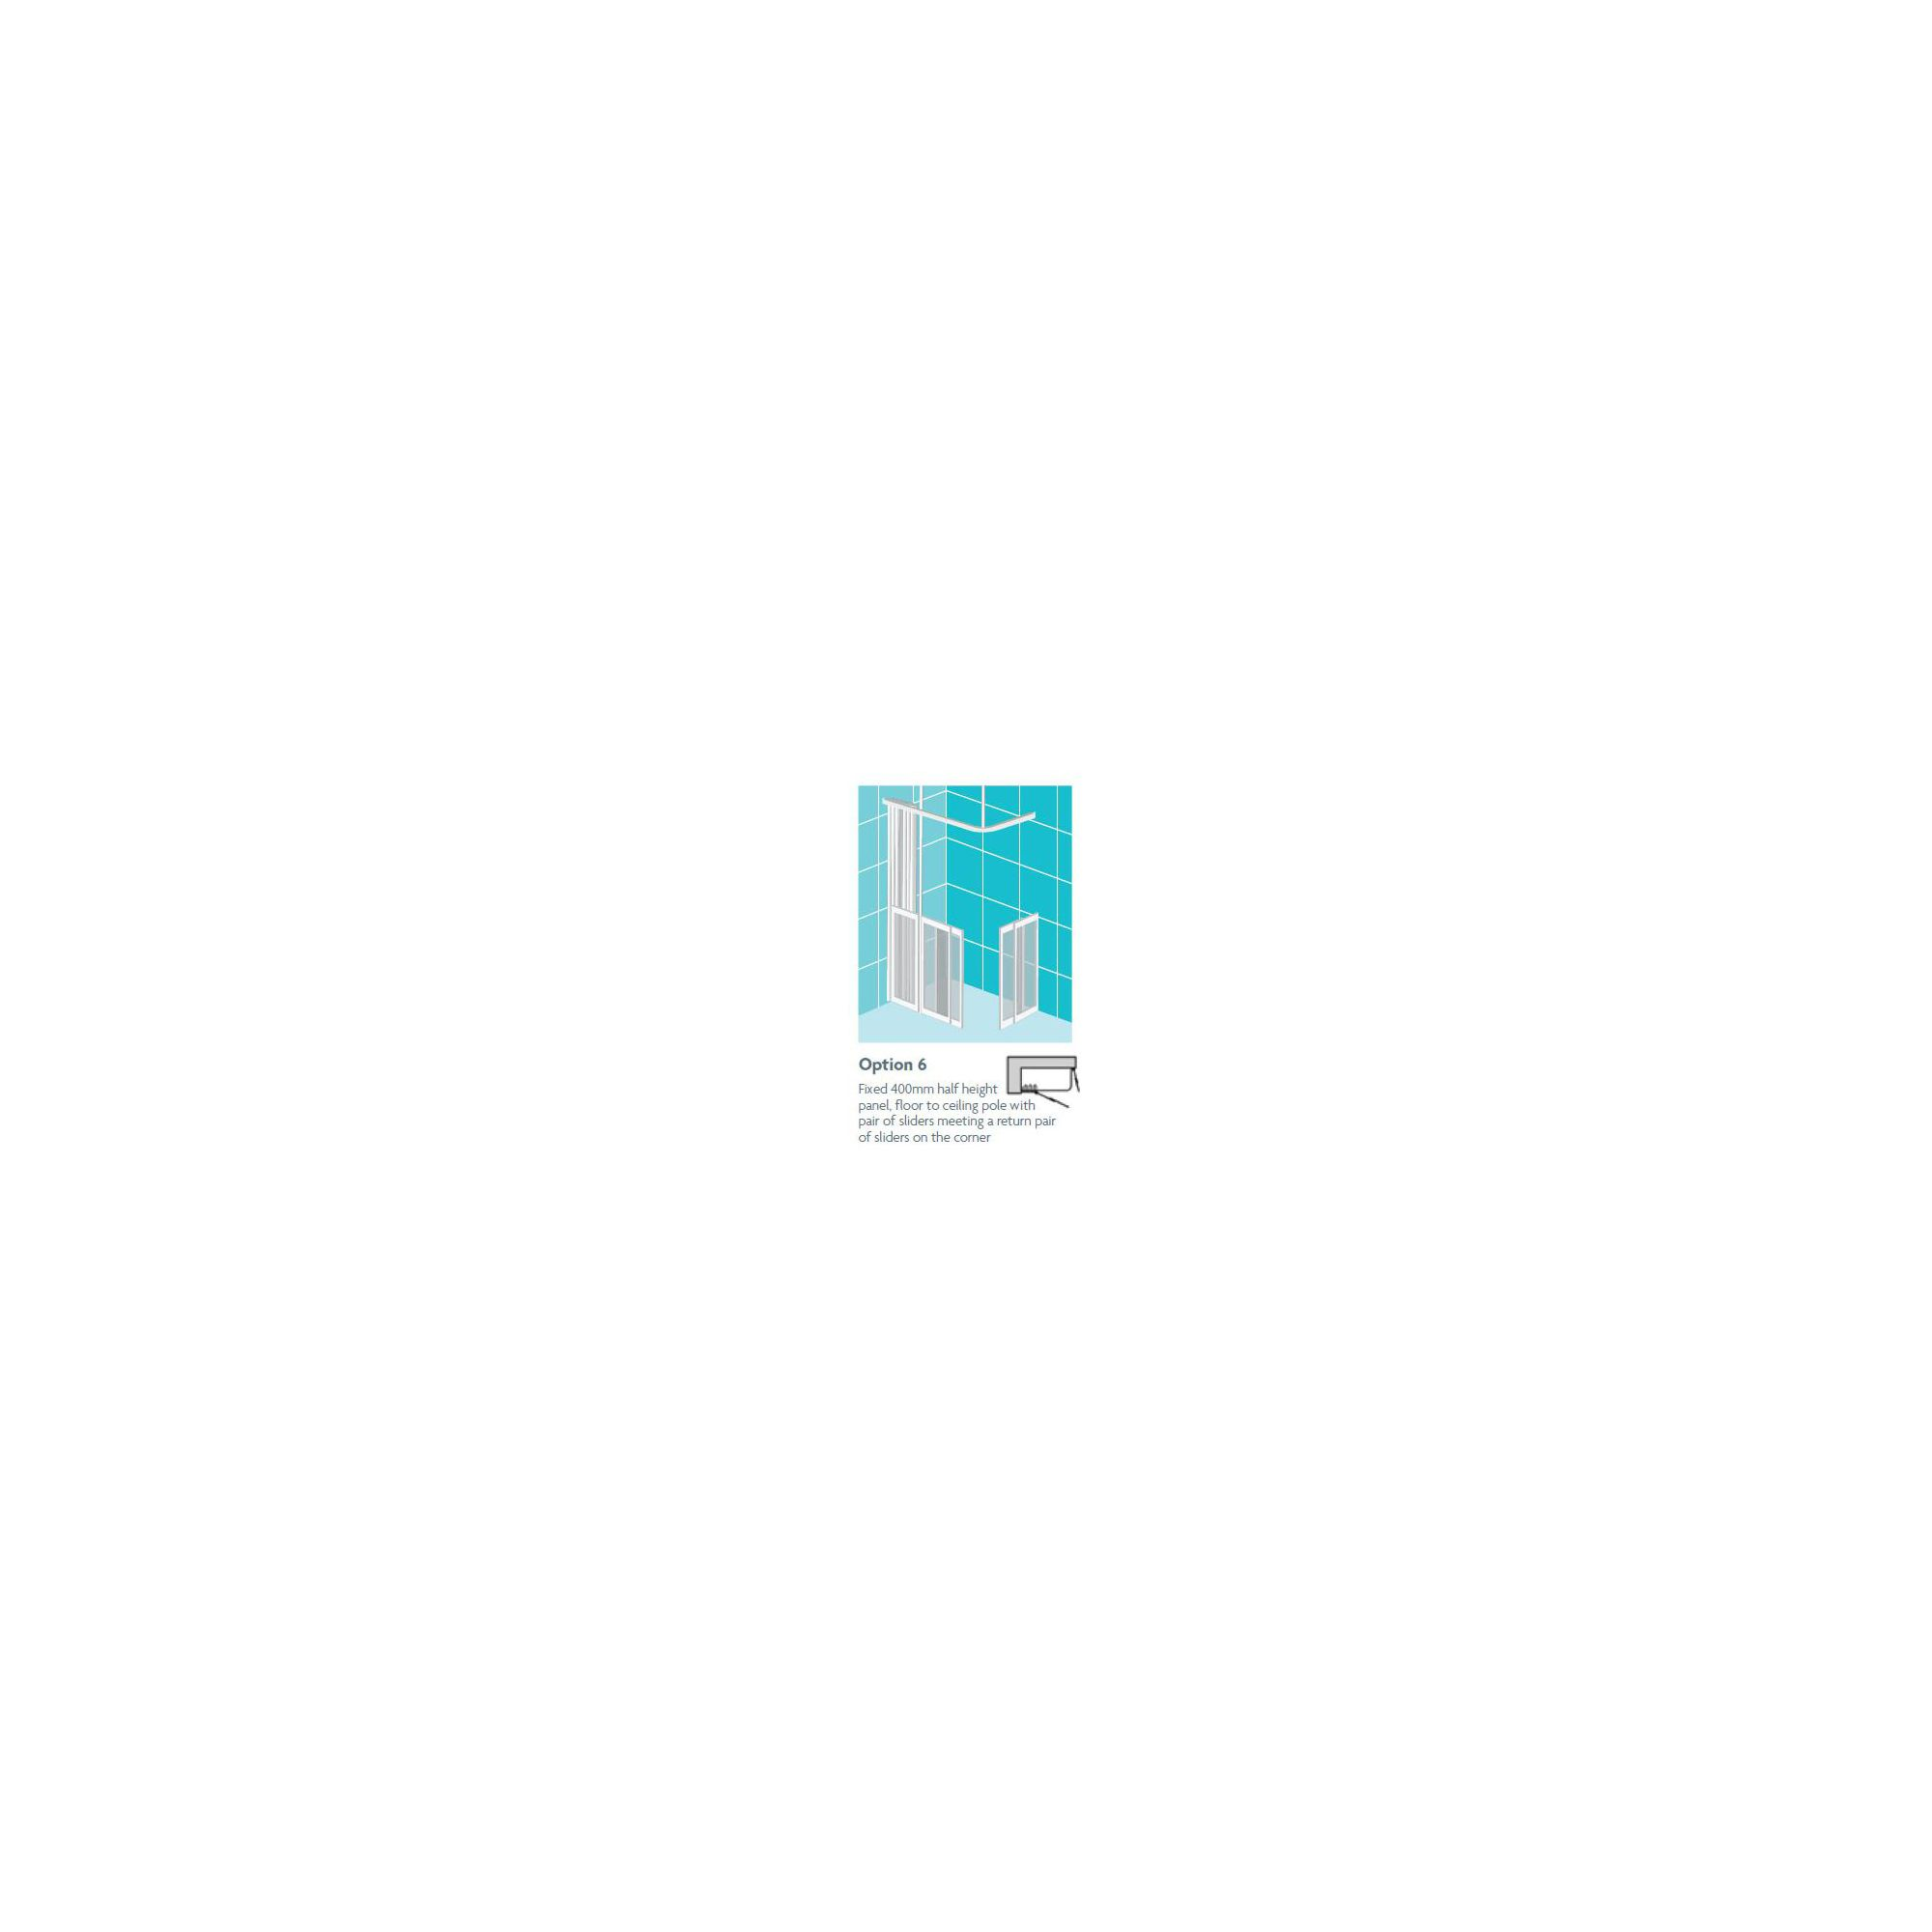 Impey Supreme Corner Door Option 6 Left Hand 1500mm x 750mm at Tescos Direct